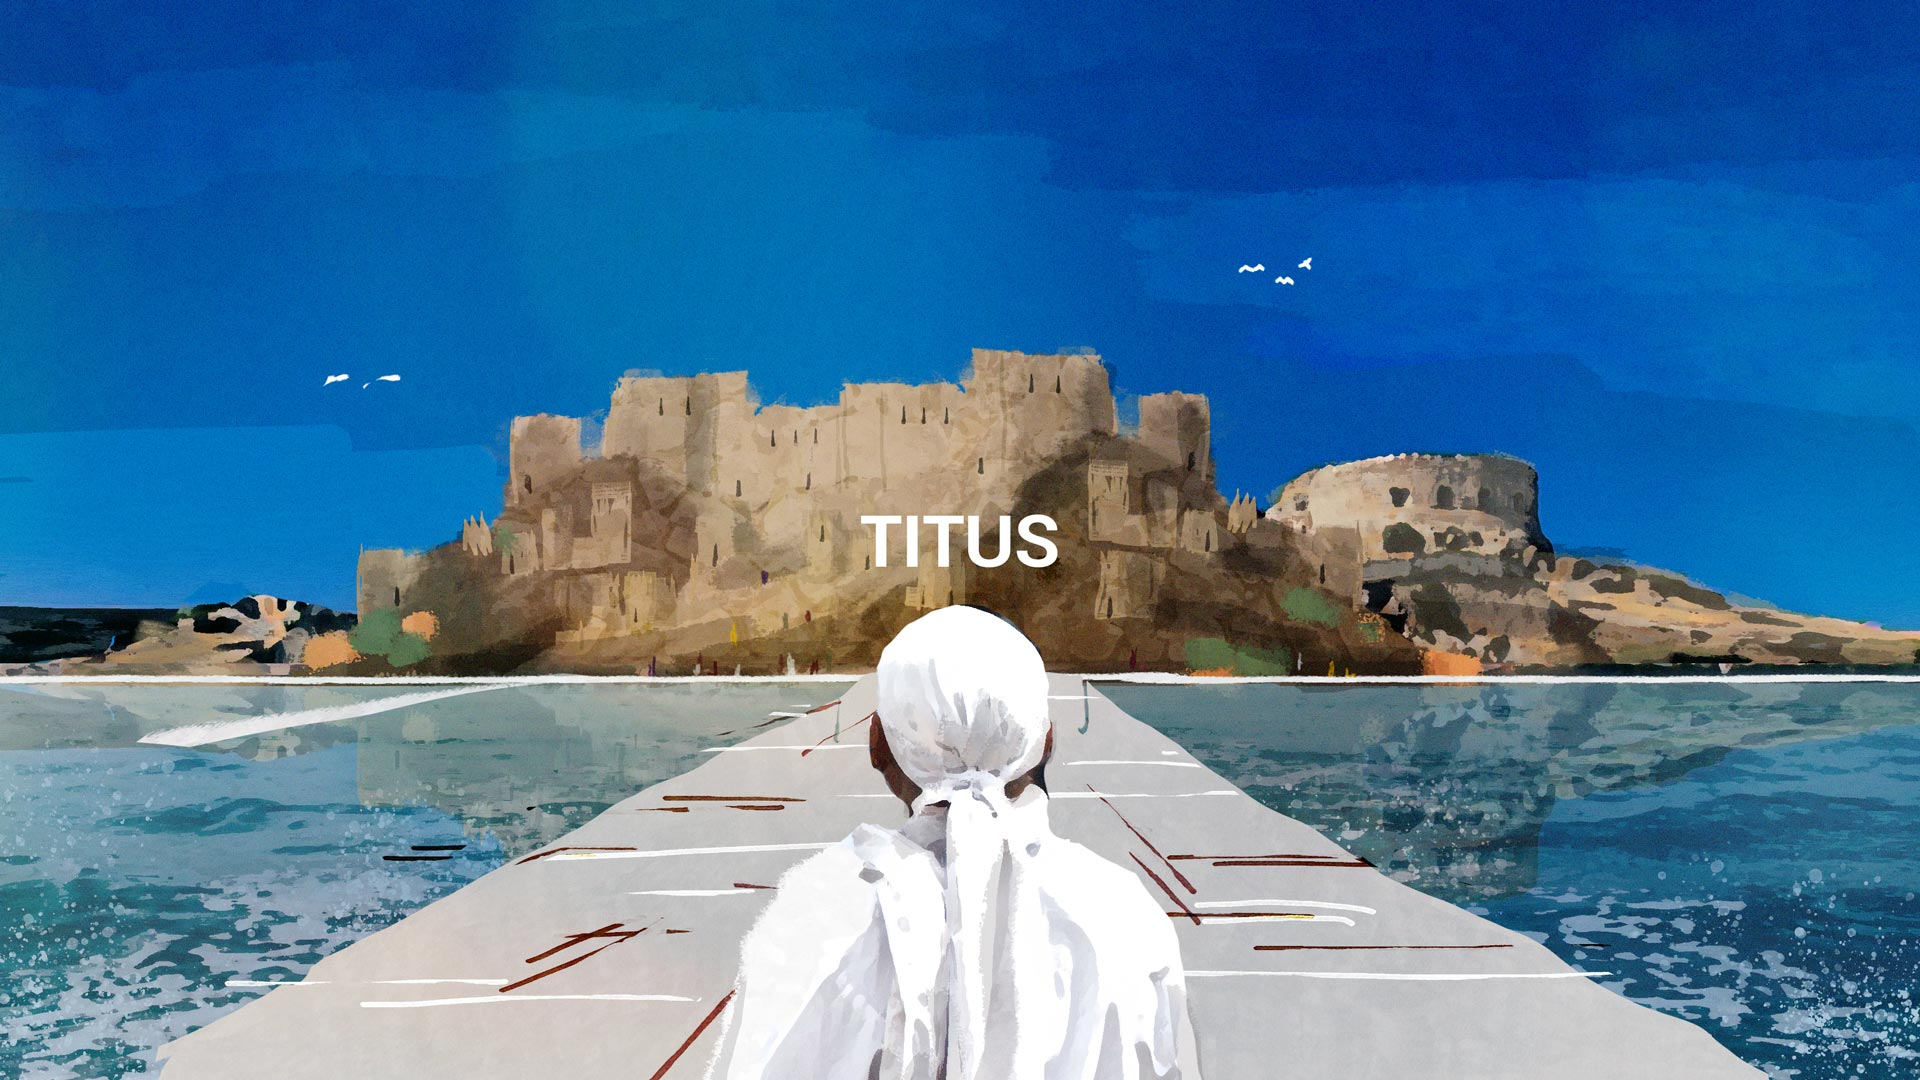 titus_1_main.jpg